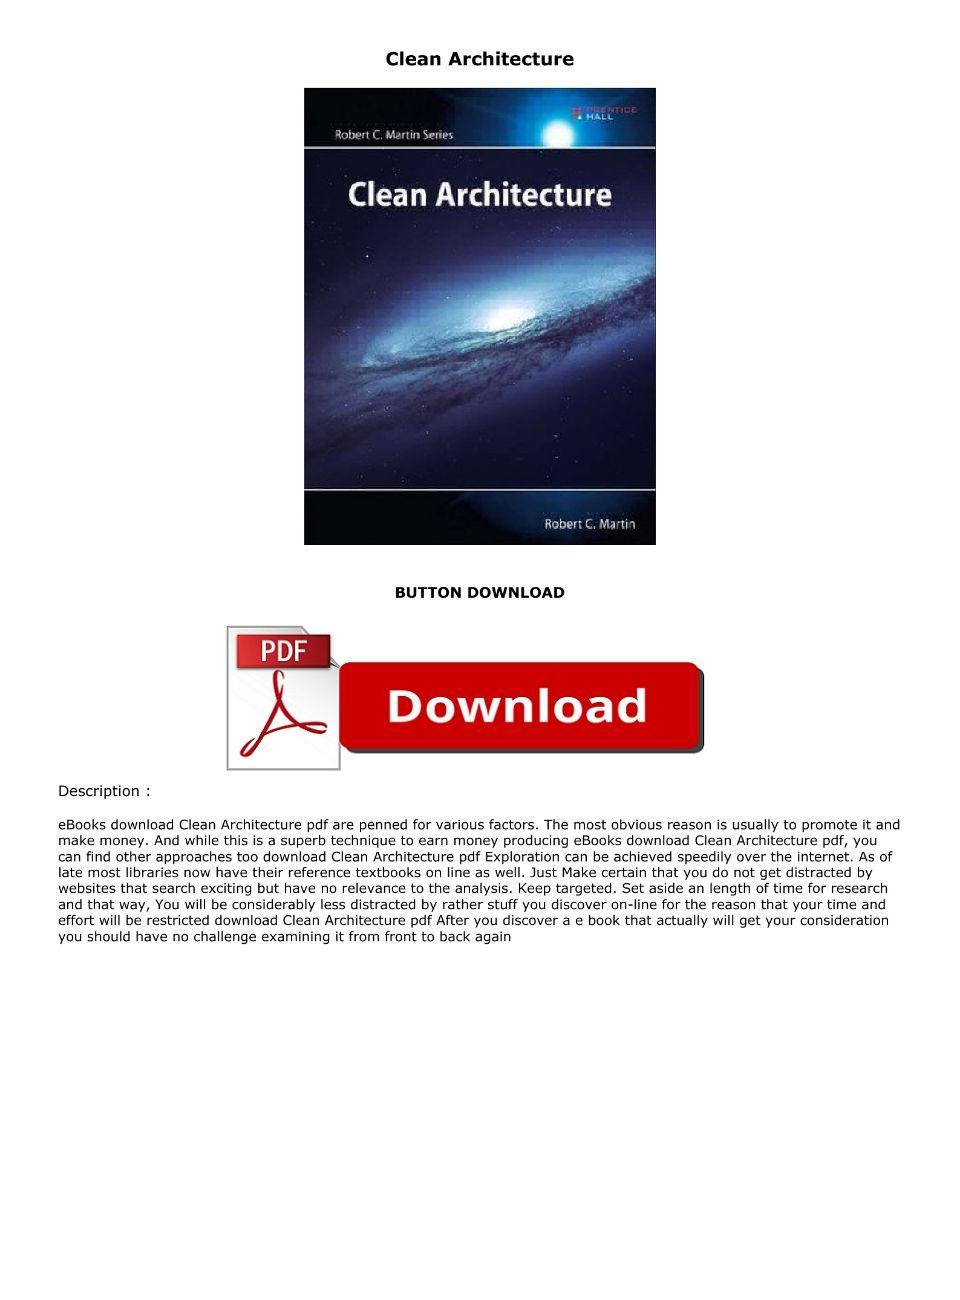 Clean Architecture Pdf Download